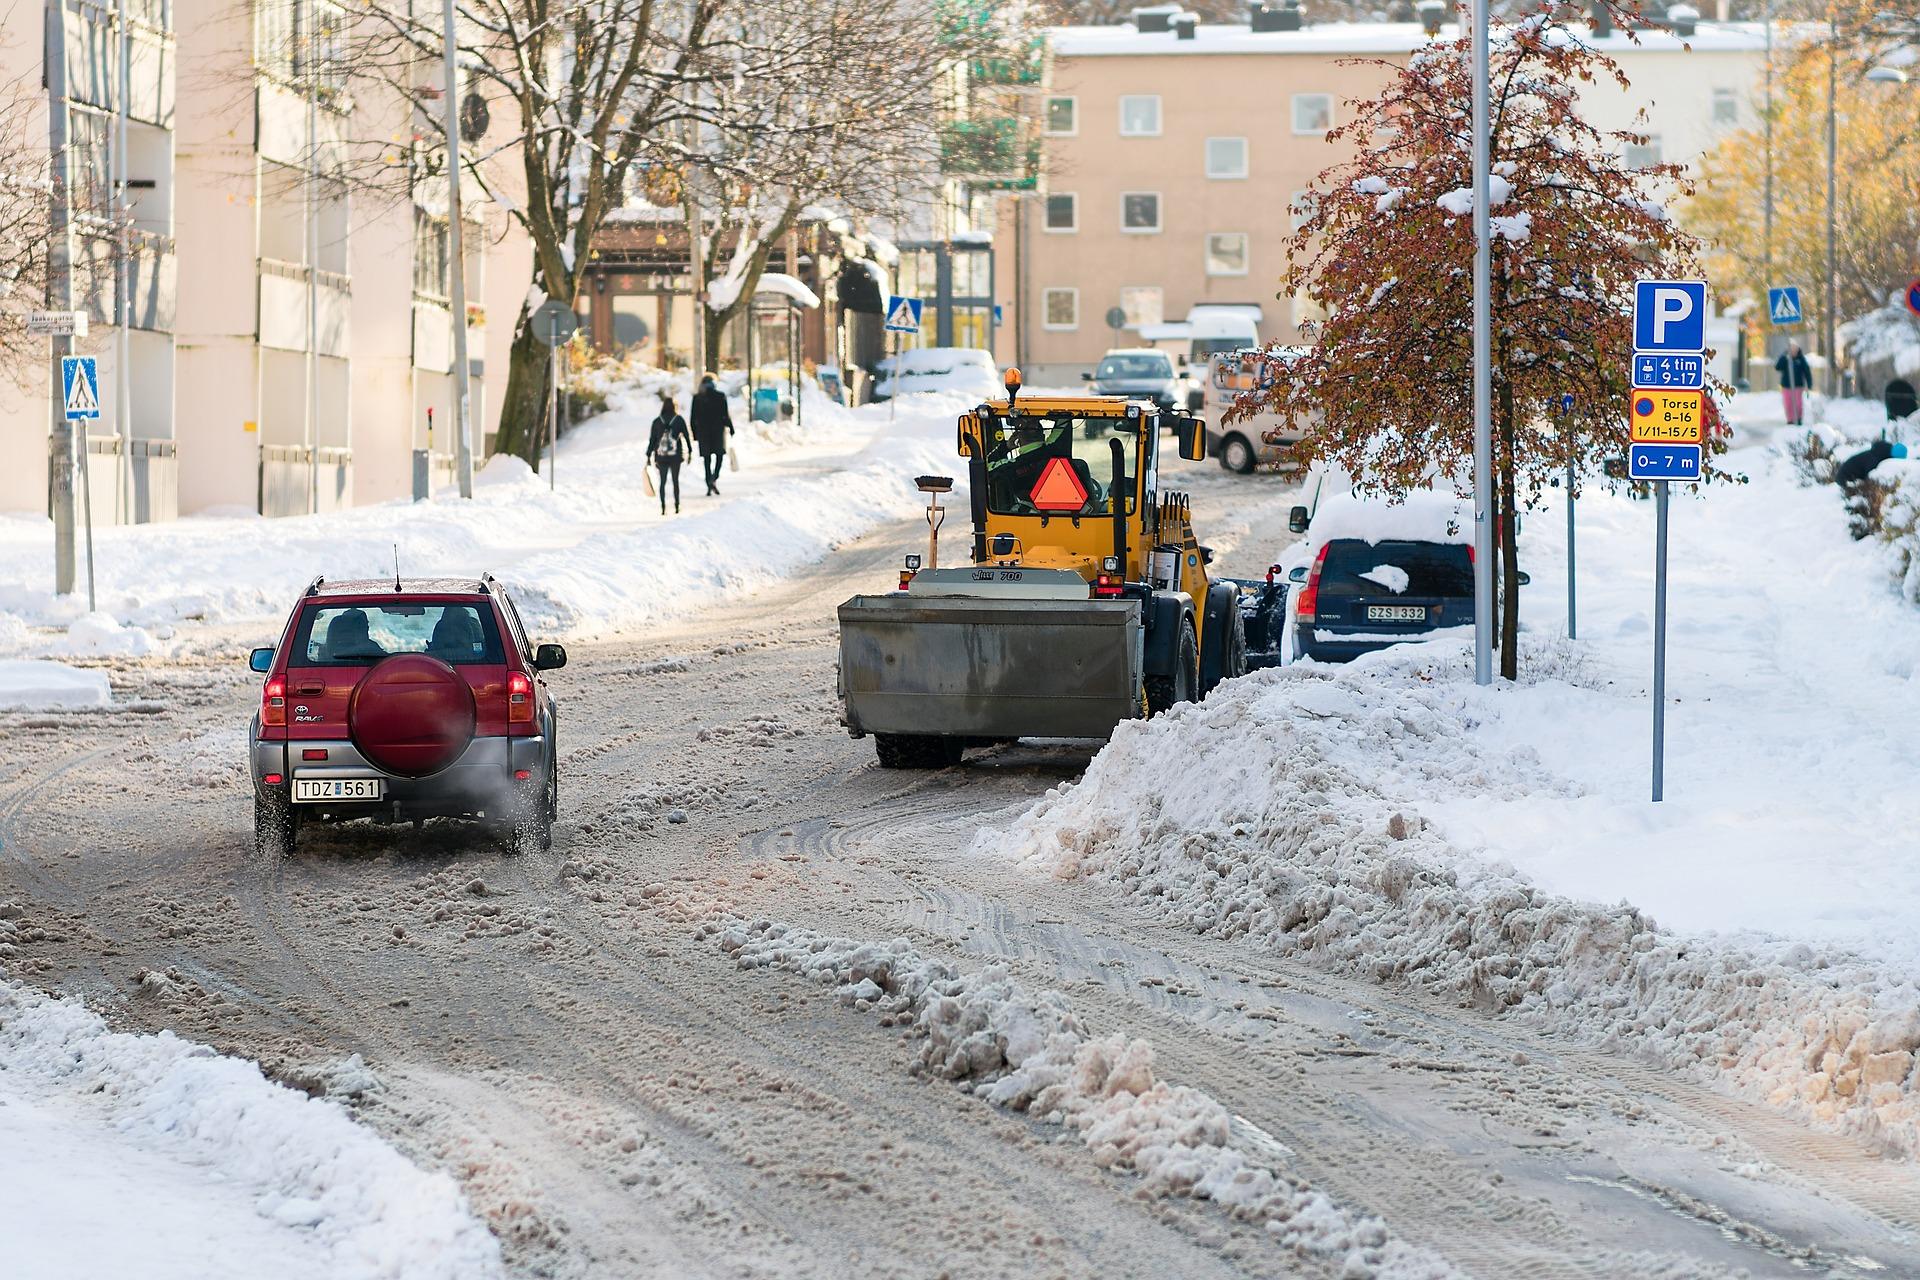 Snöskottning på gata i Stockholm